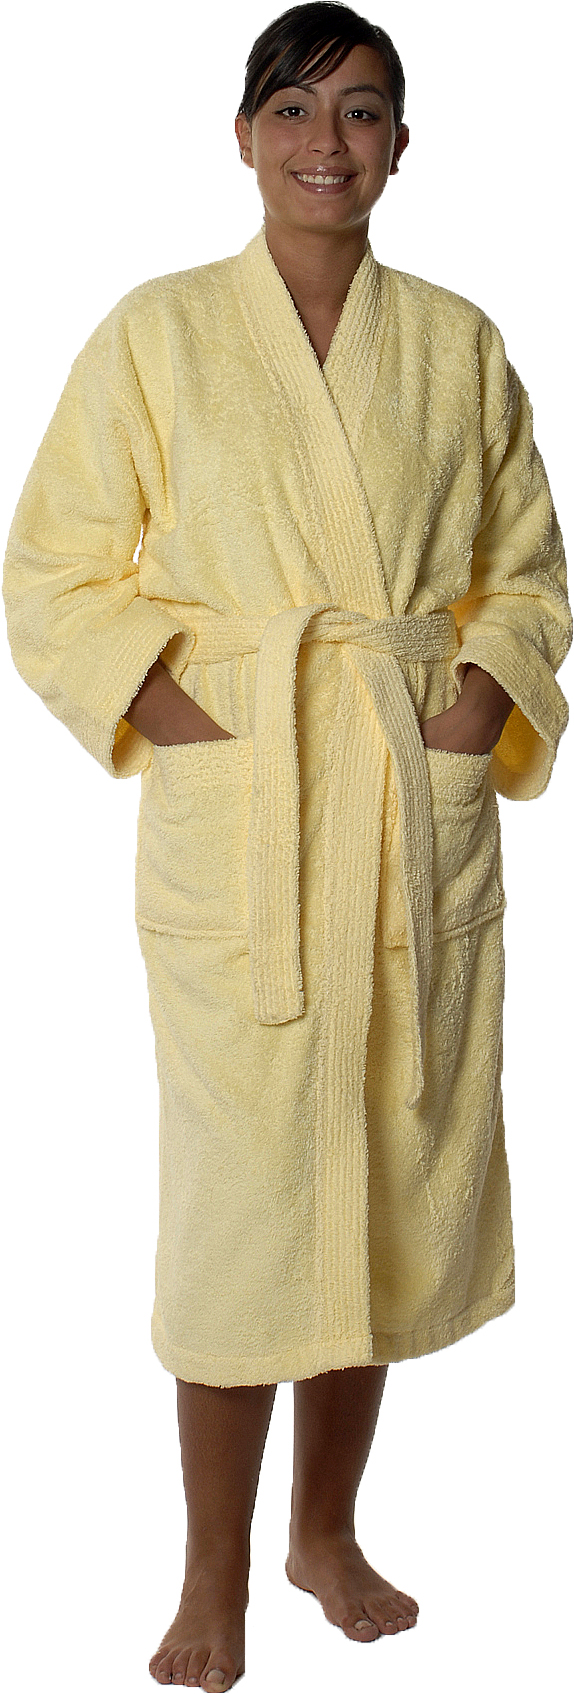 Peignoir col kimono en Coton couleur Jaune Taille XL (Jaune)